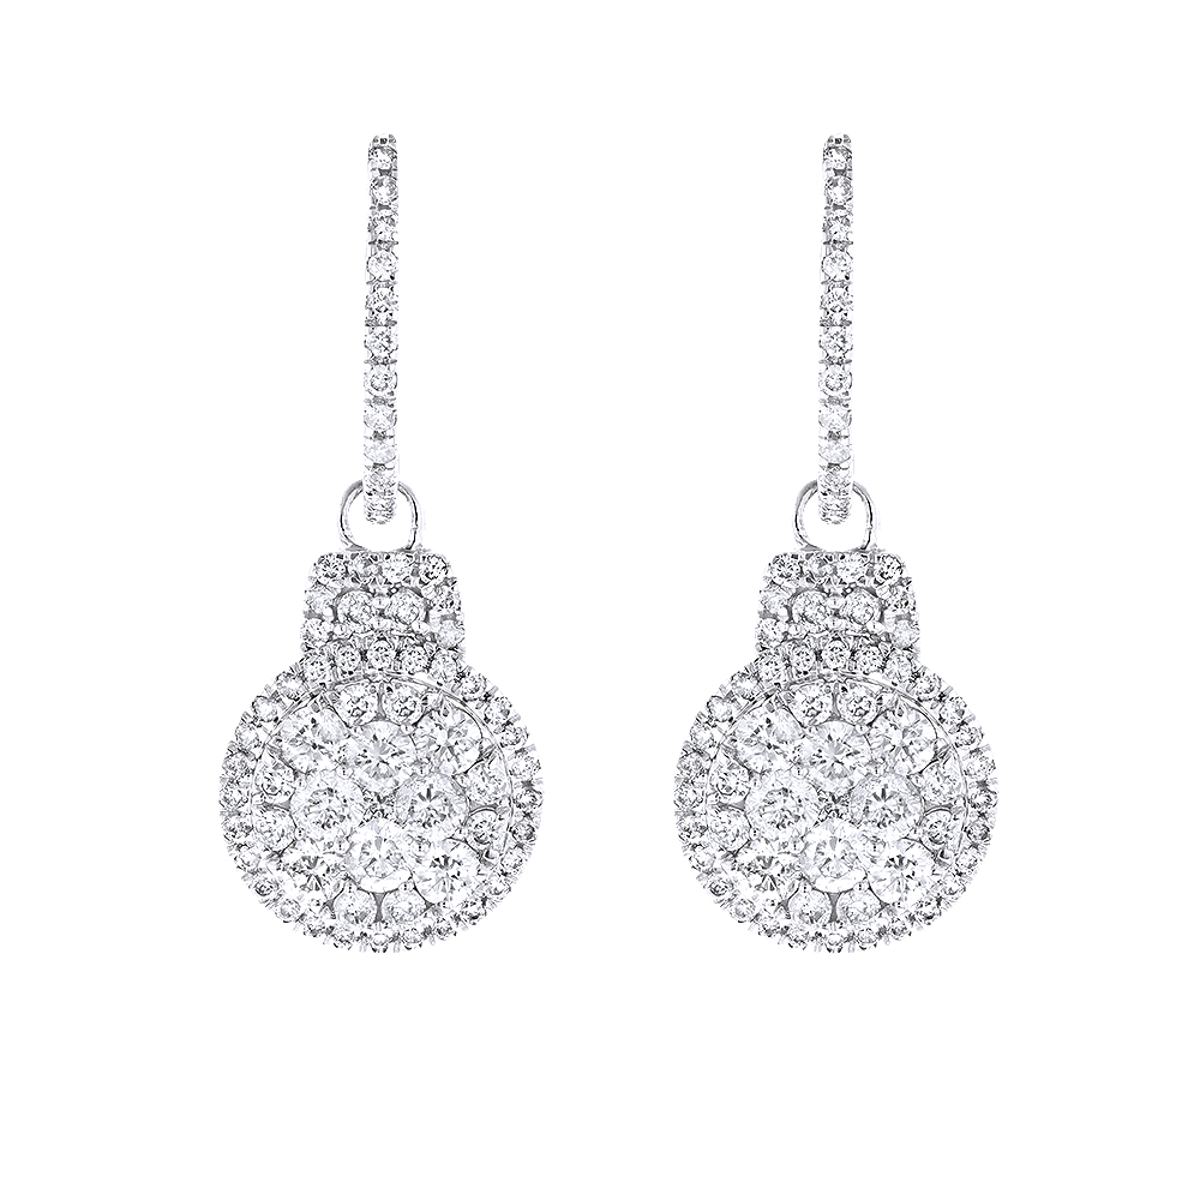 14K Gold Diamond Circle Earrings 1.95ct